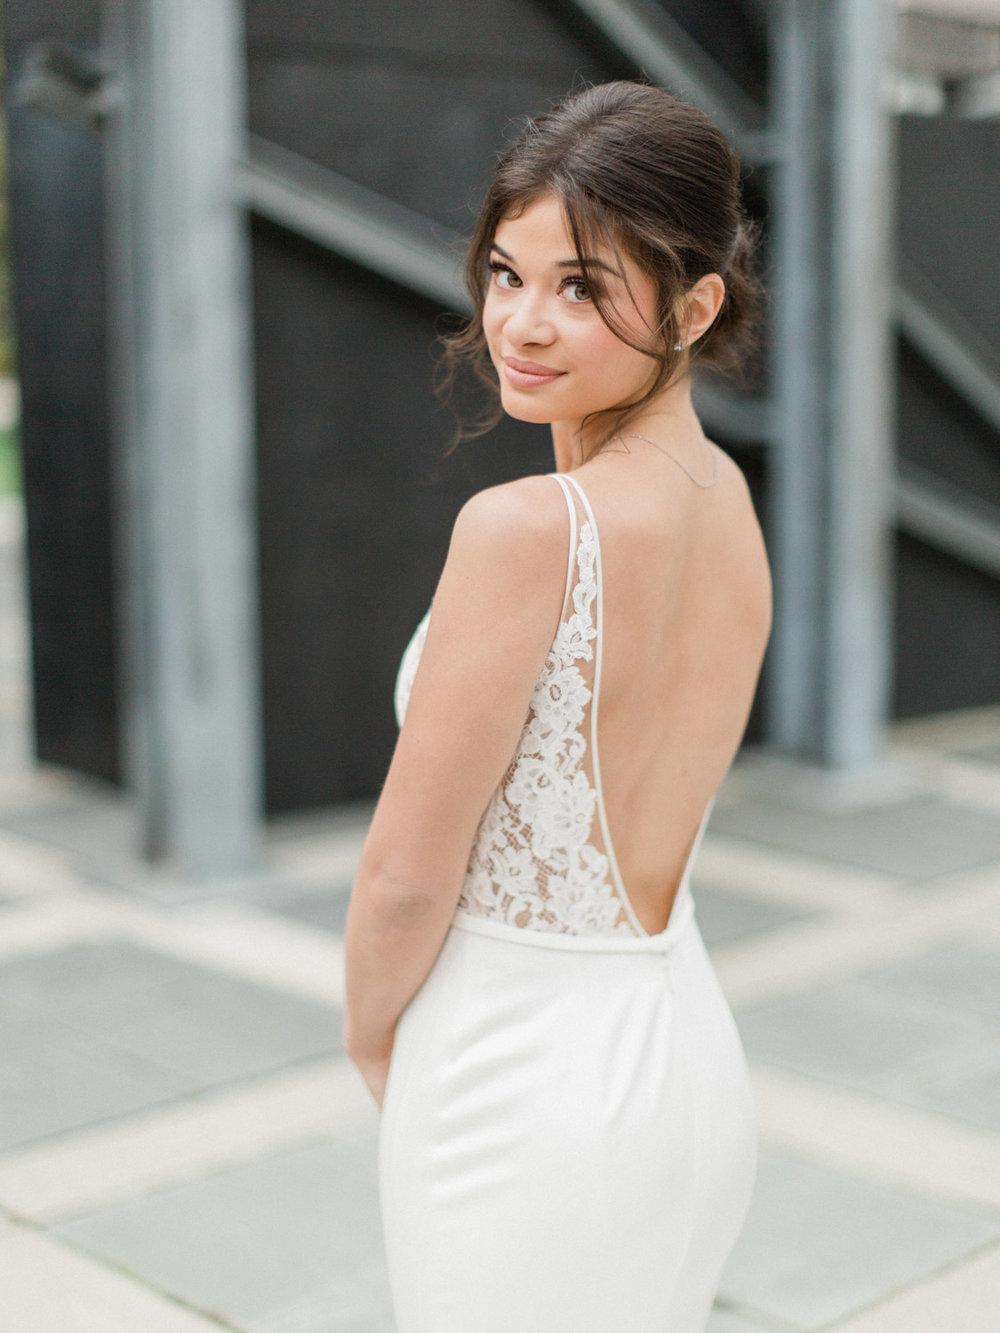 Toronto-wedding-photographer-intimate-italian-the-burroughes-downtown50.jpg